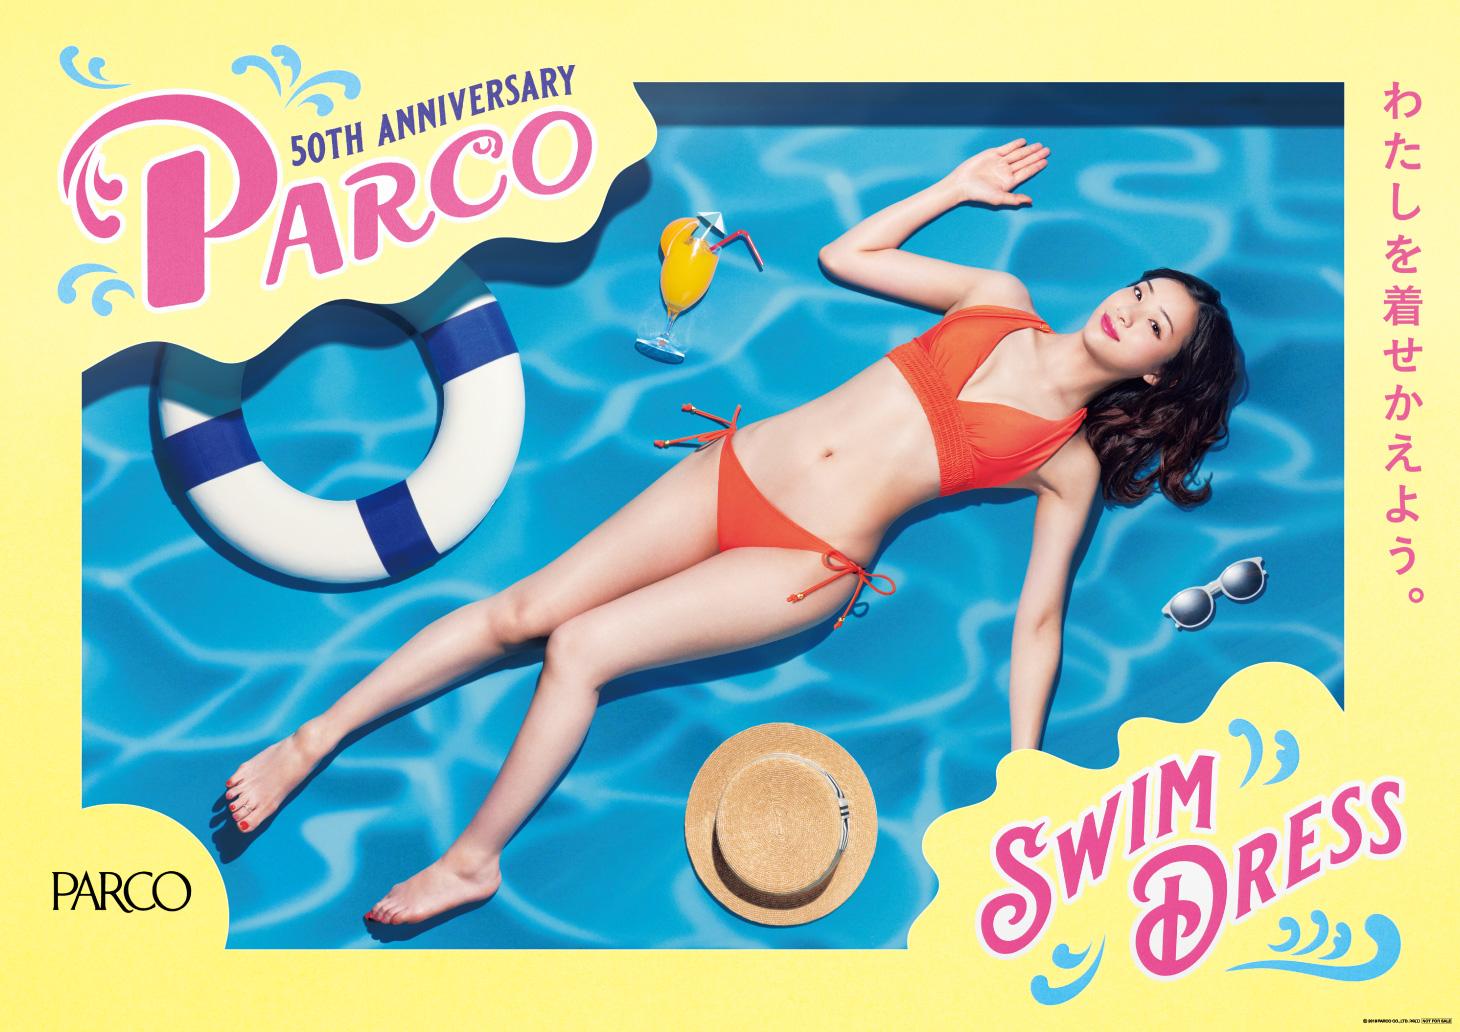 90e2ccccdcf 「PARCO SWIM DRESS 2019」メイキングムービー公開!足立梨花さん、4年ぶりに水着撮影に挑戦!|株式会社パルコのプレスリリース